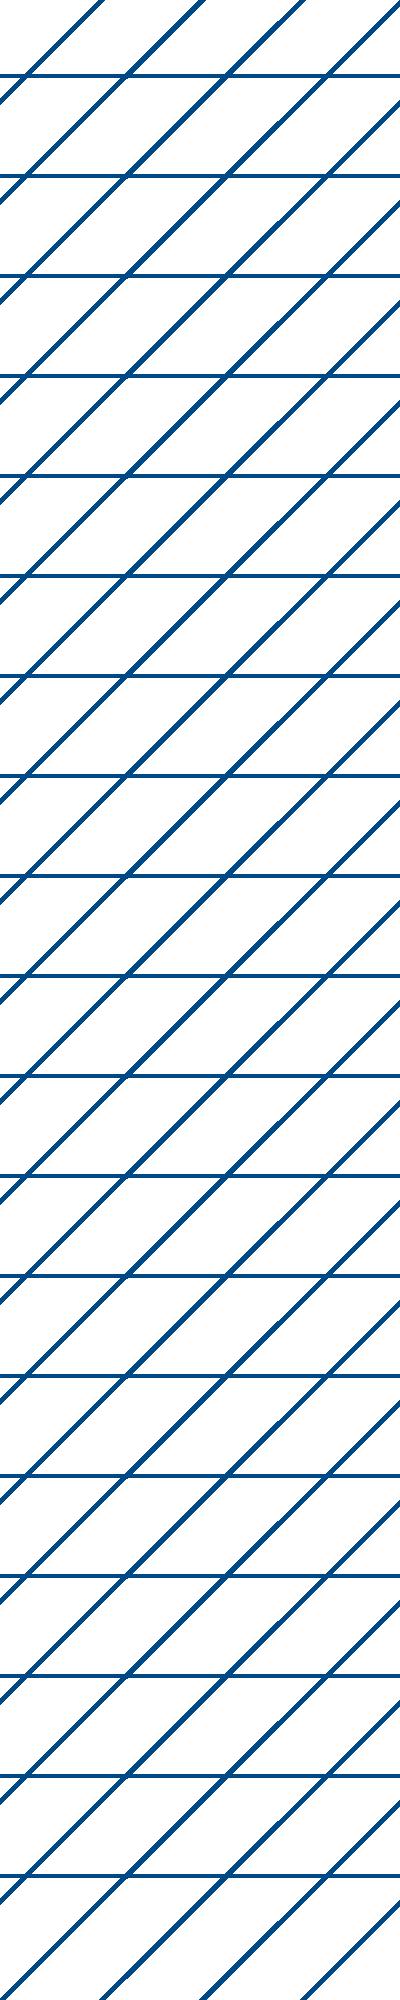 horizontal-blue-lines-rev